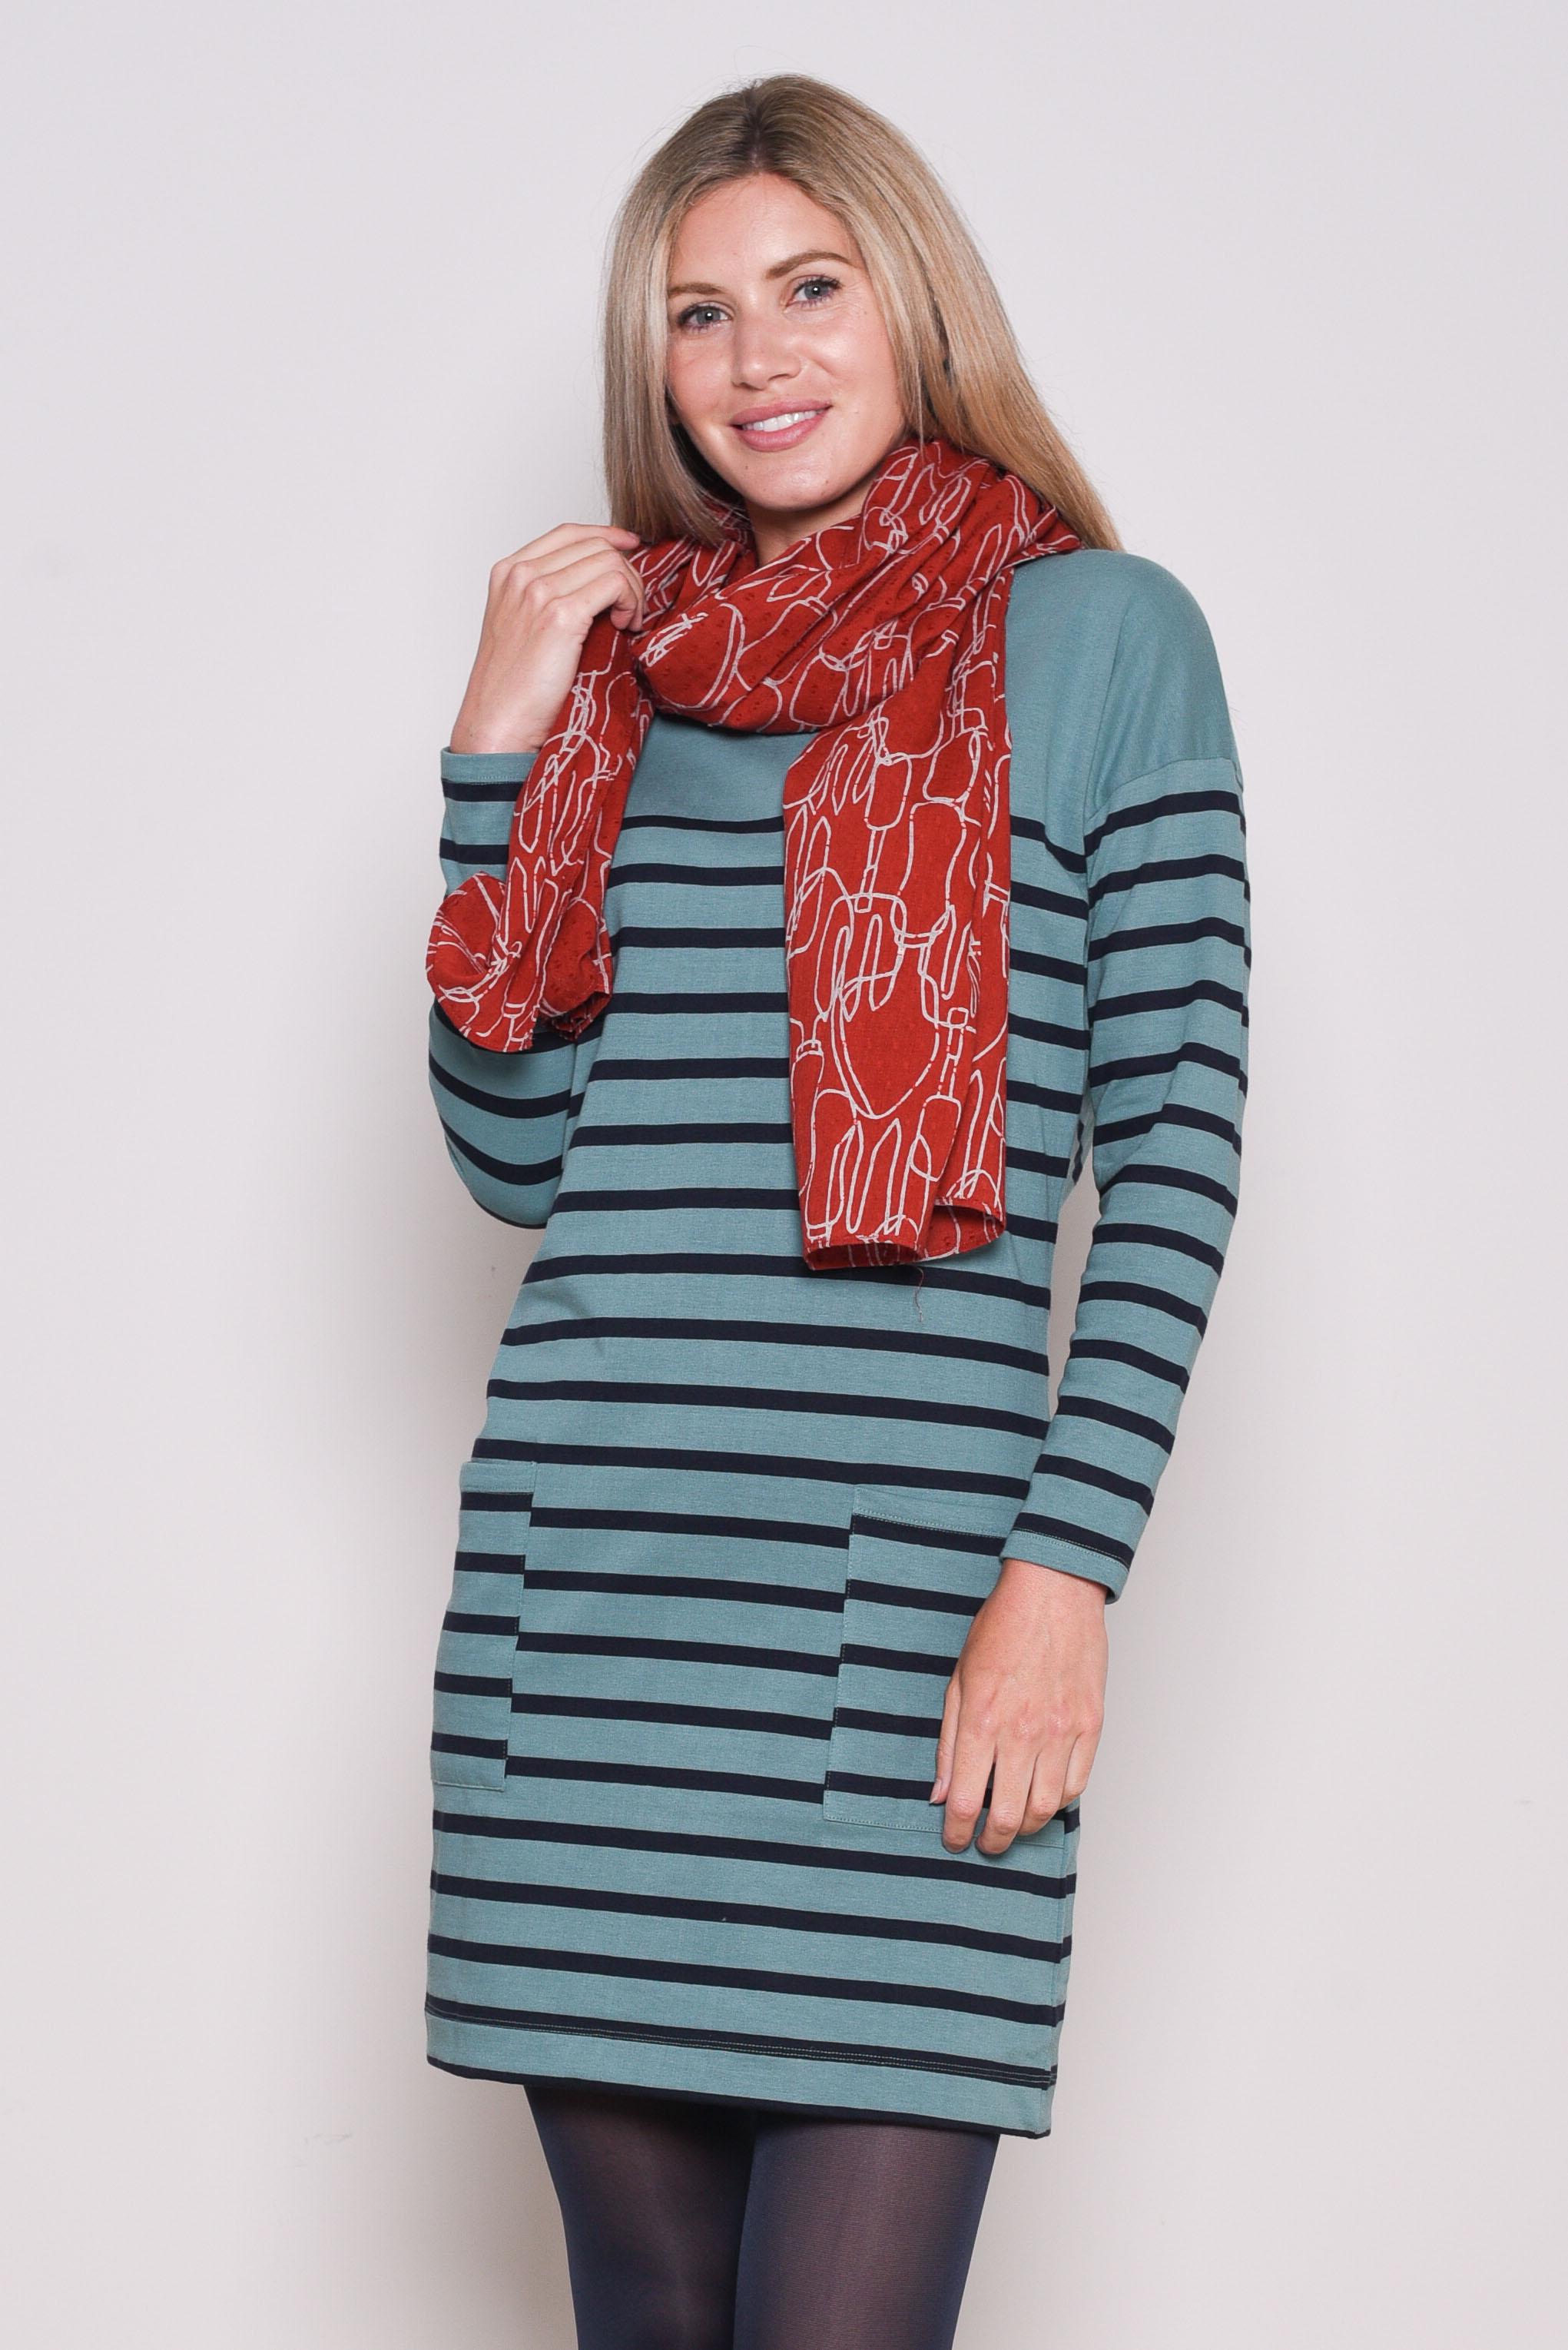 Brakeburn Block Stripe Dress - Size 20 only